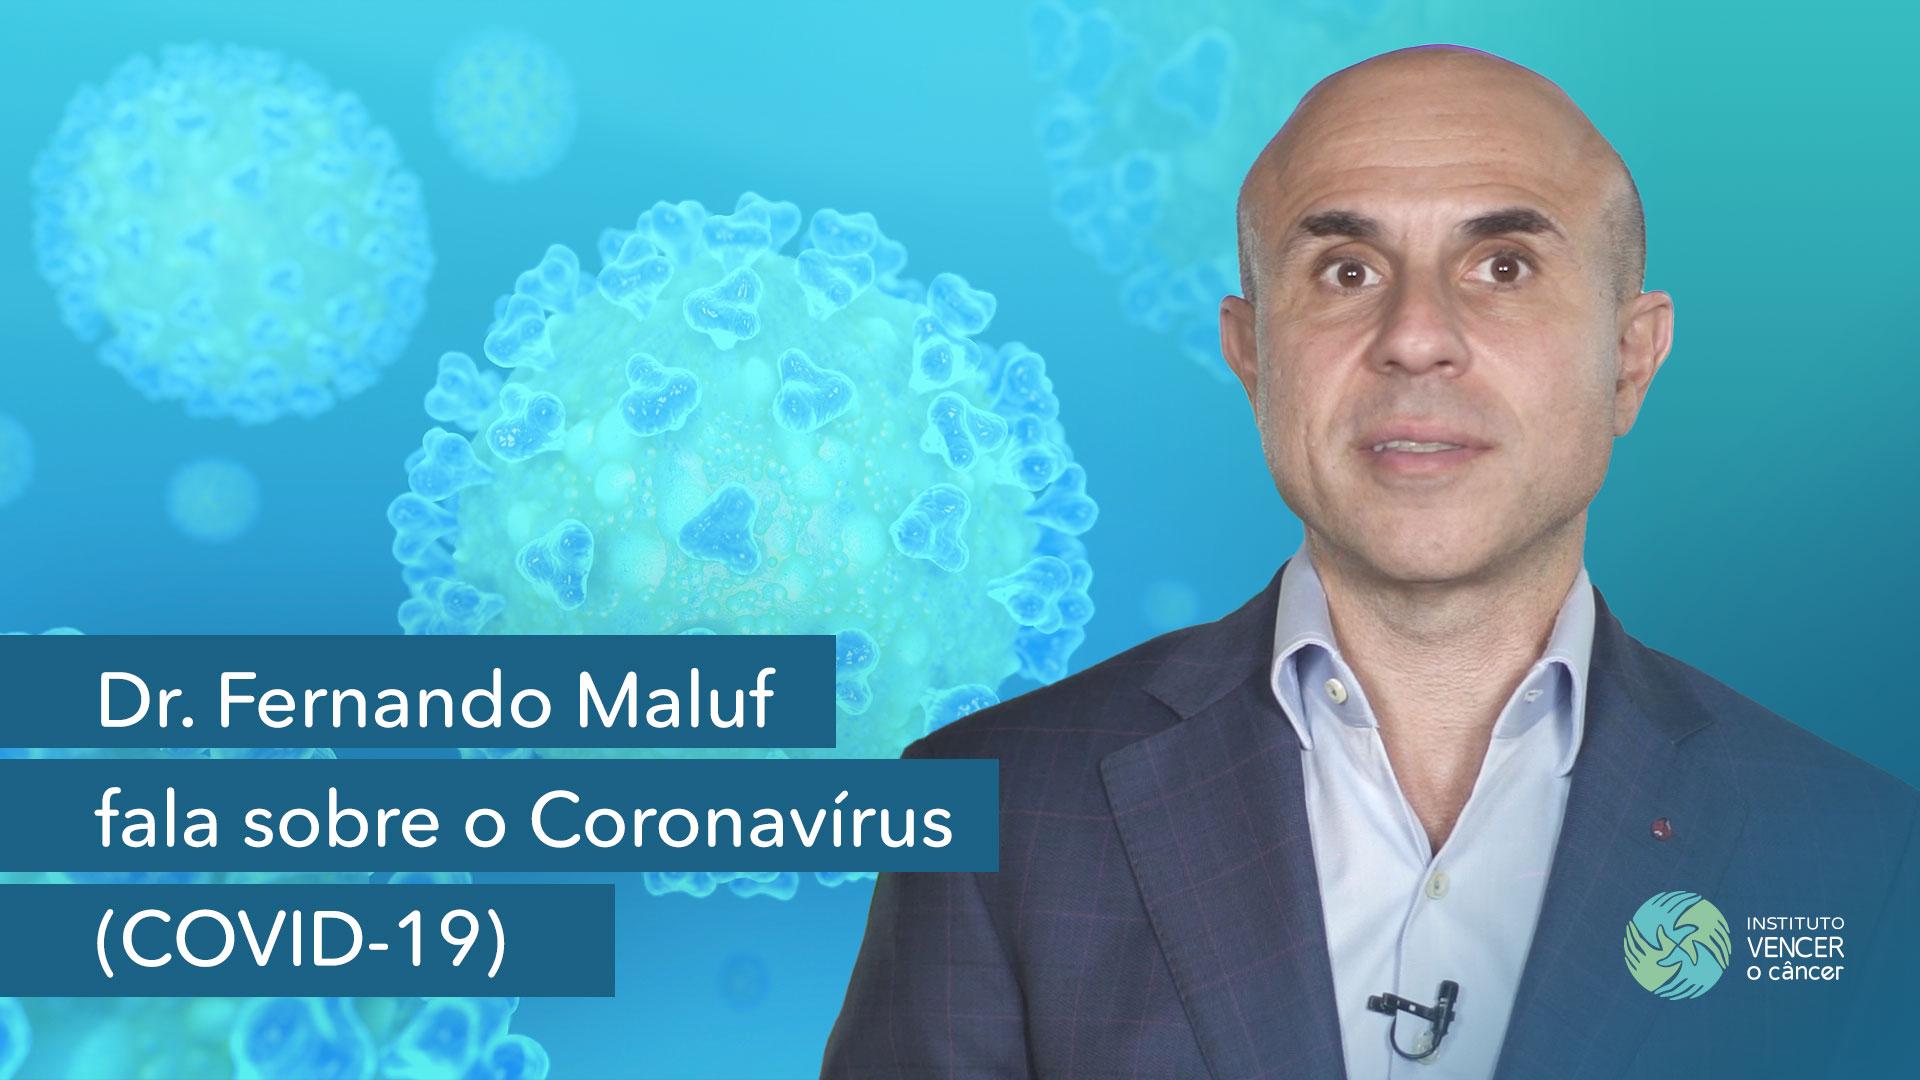 Dr. Fernando Maluf fala sobre o Coronavírus (COVID-19)